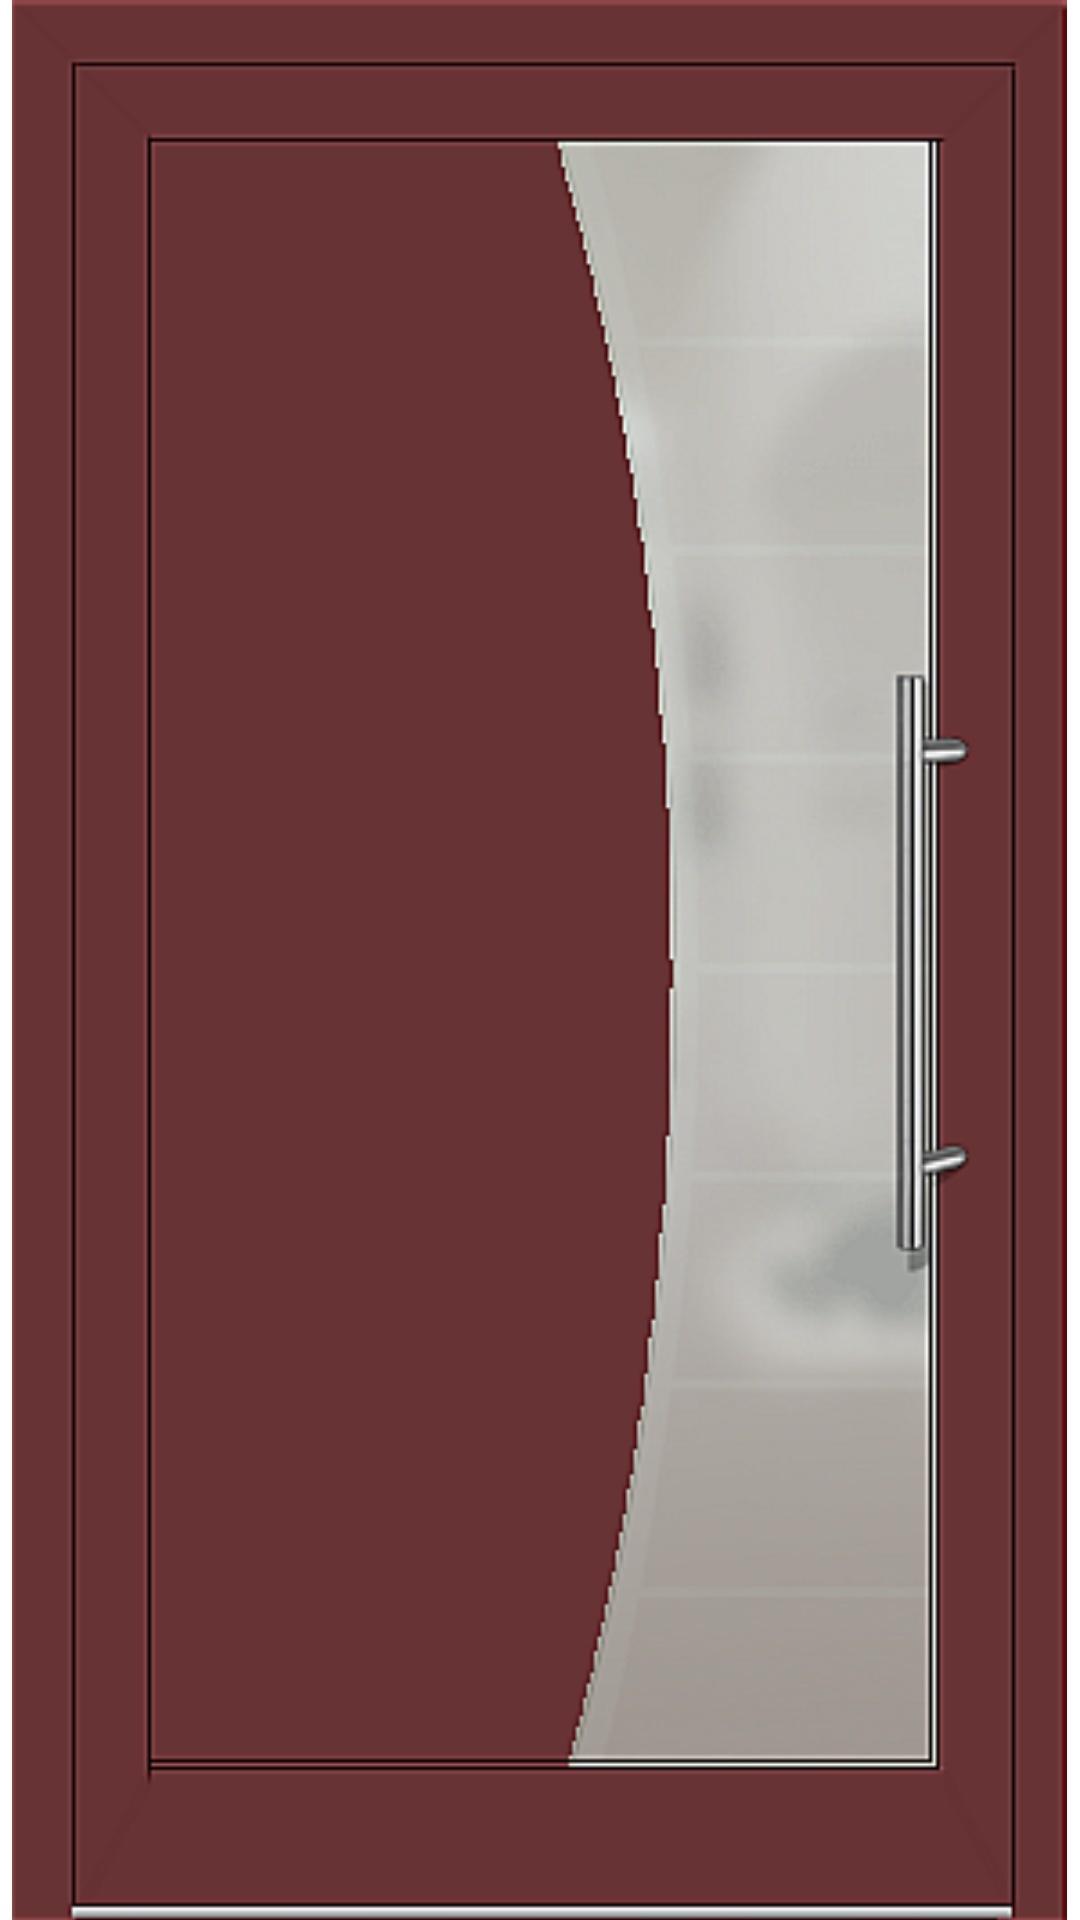 Kunststoff Haustür Modell 6516-50 braunrot